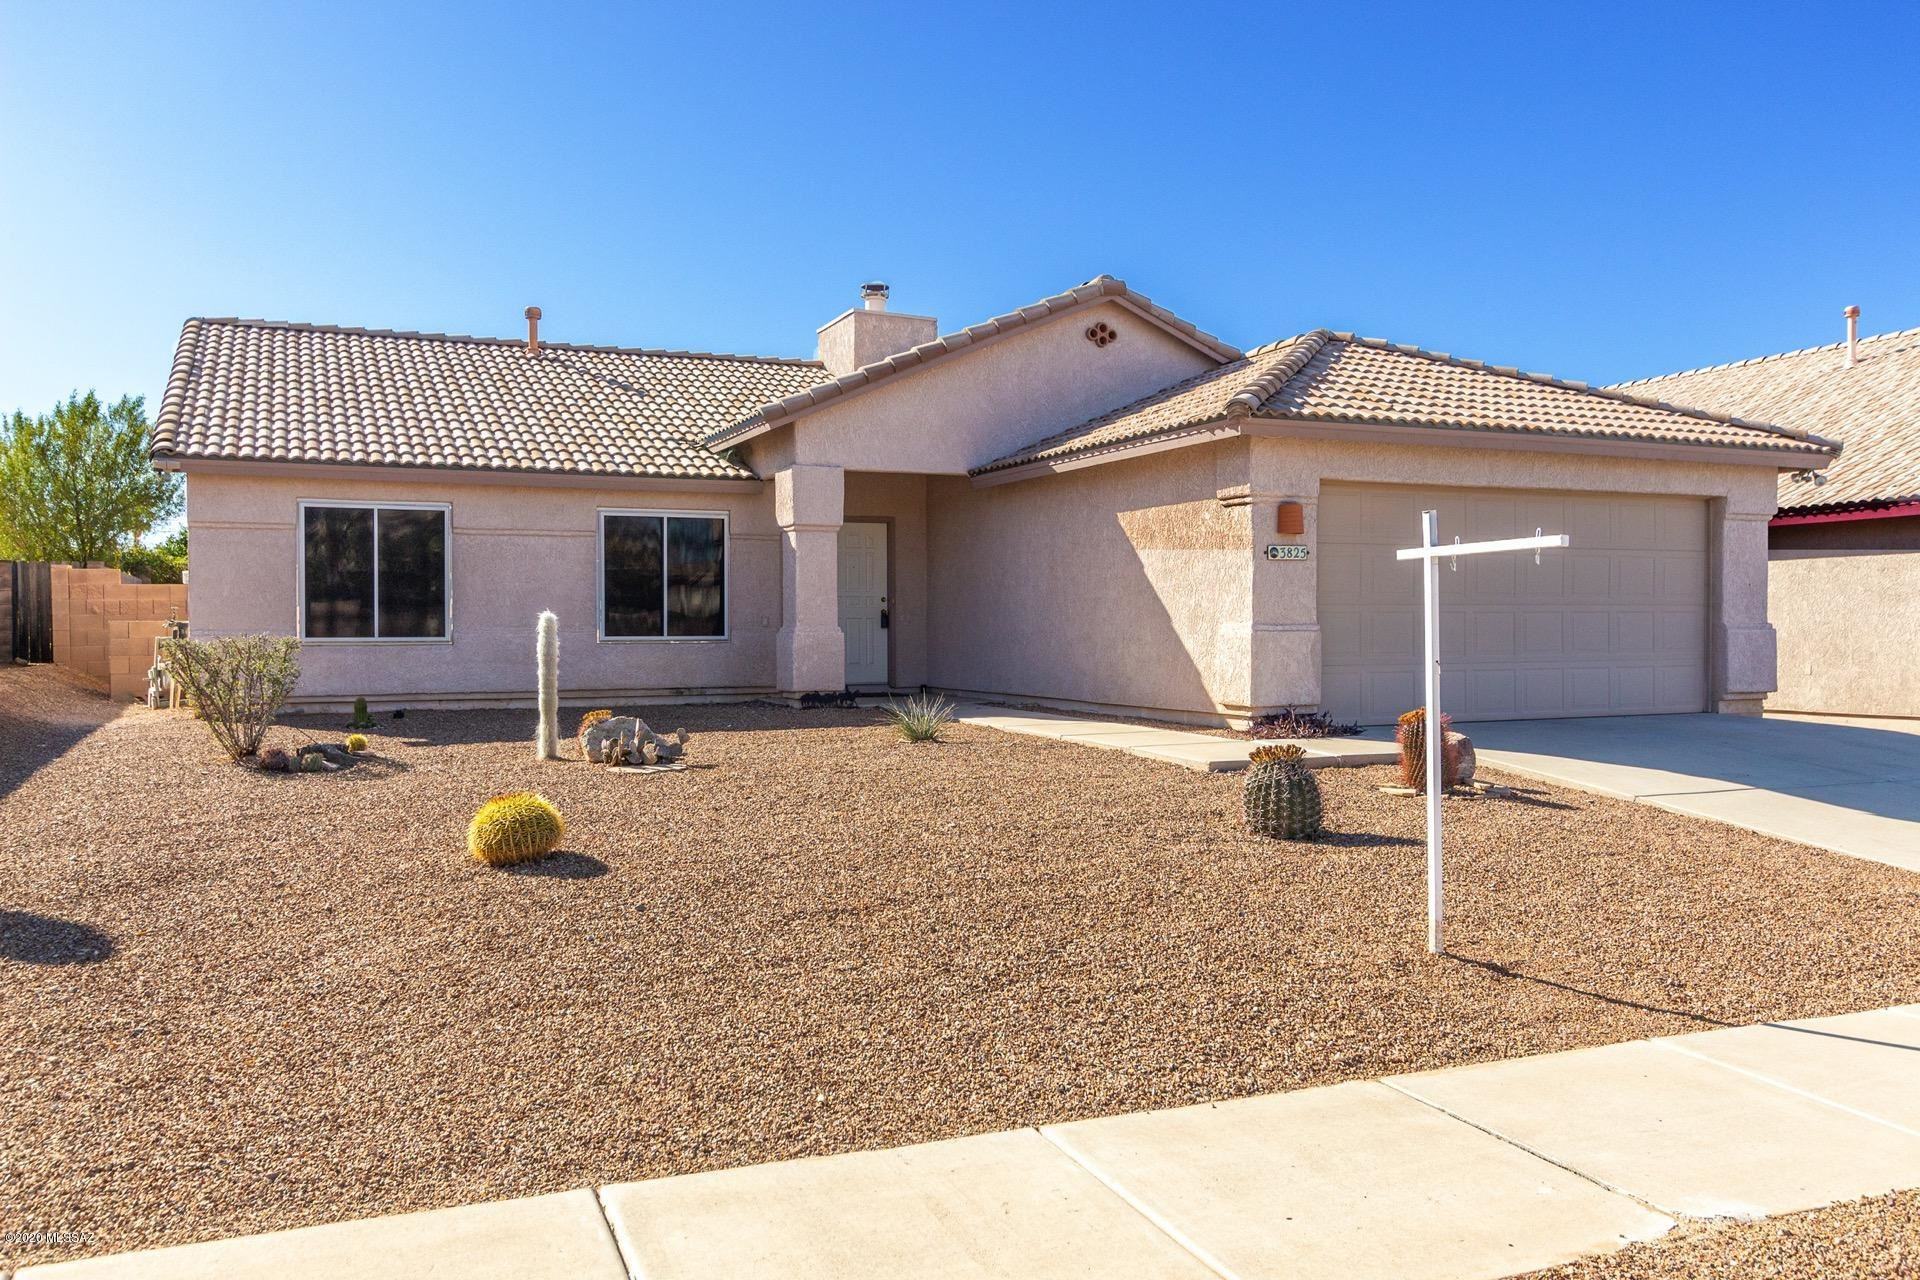 3825 W Carina Street, Tucson, AZ 85742 - #: 22028534